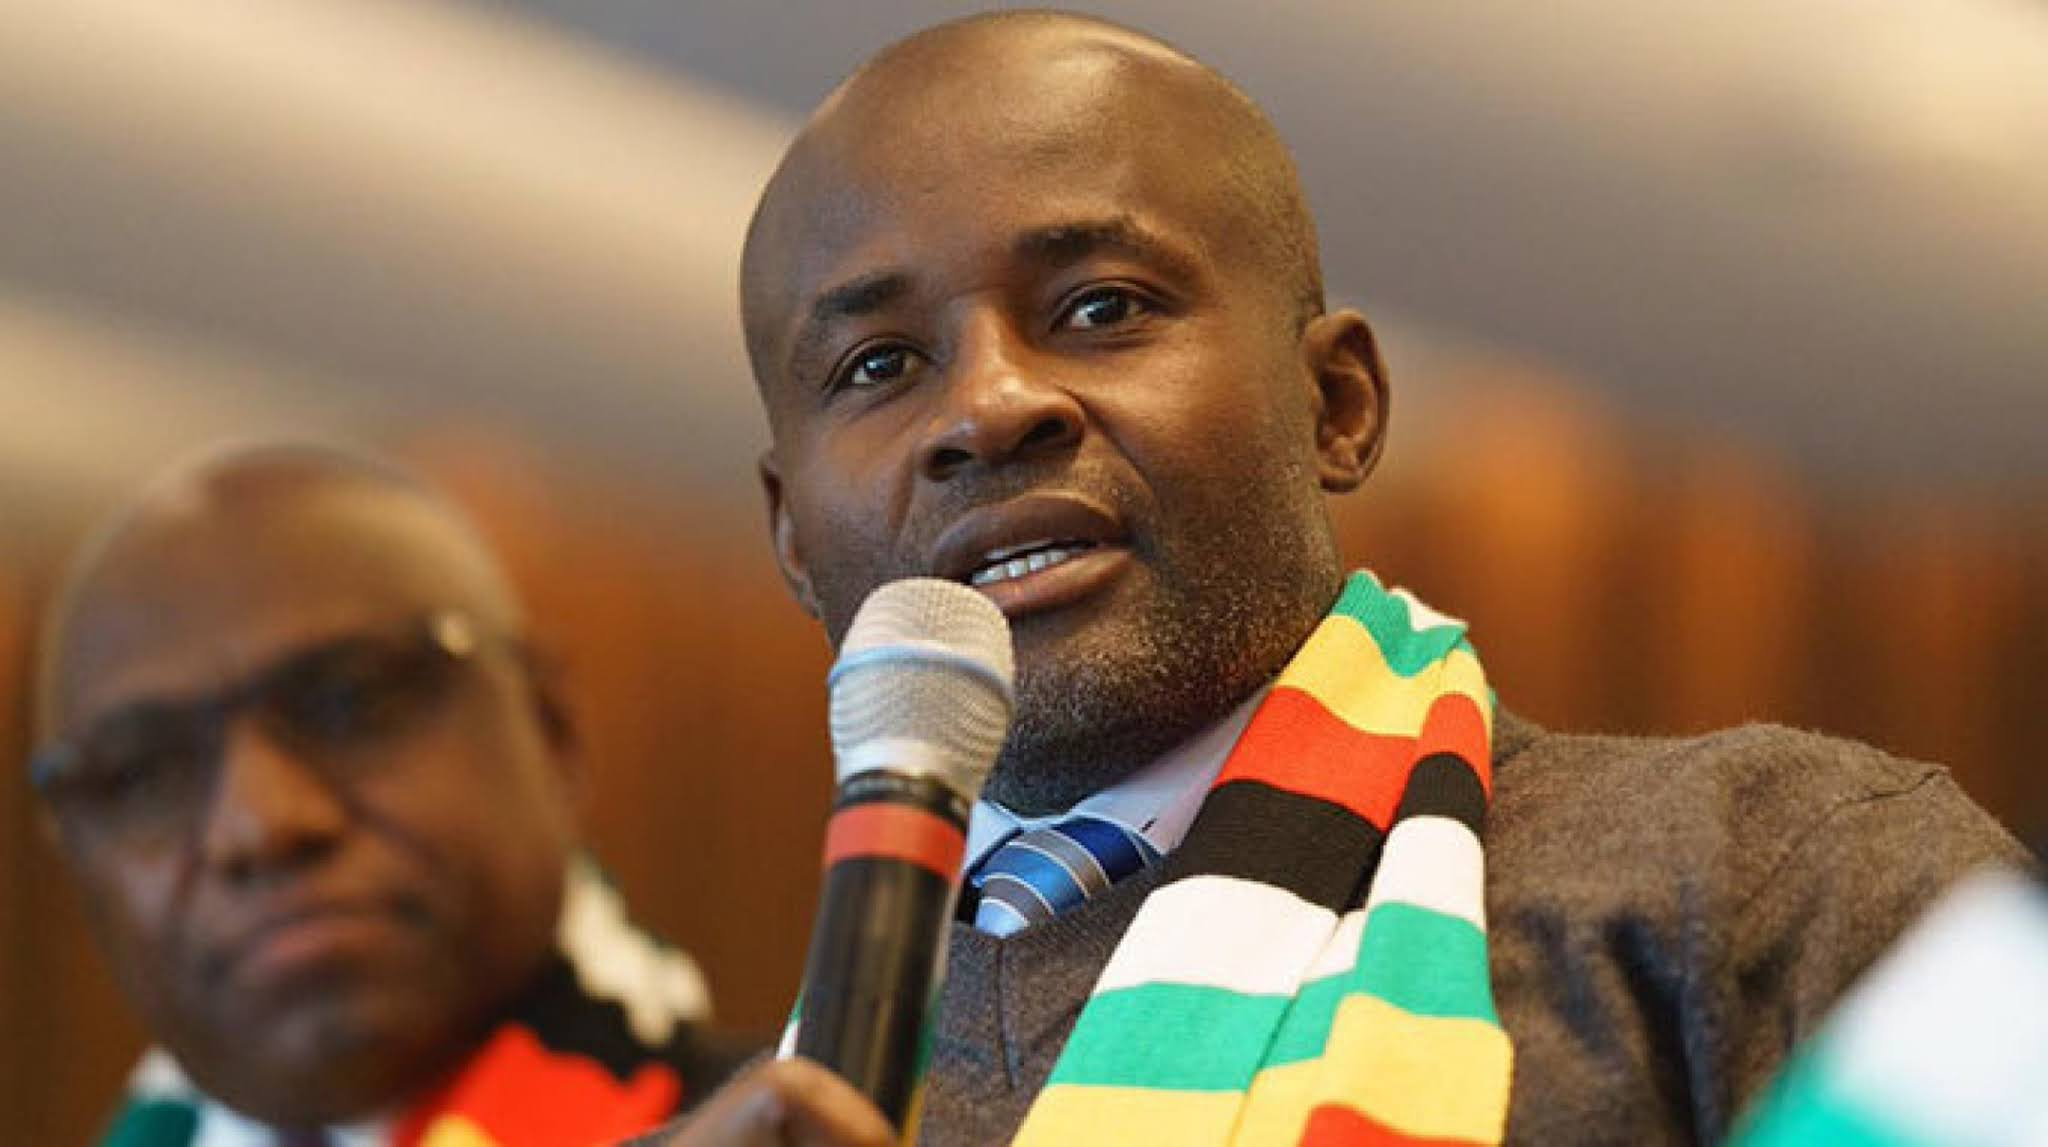 'No Politician Will Get Sendoff Like Ginimbi' says Temba Mliswa